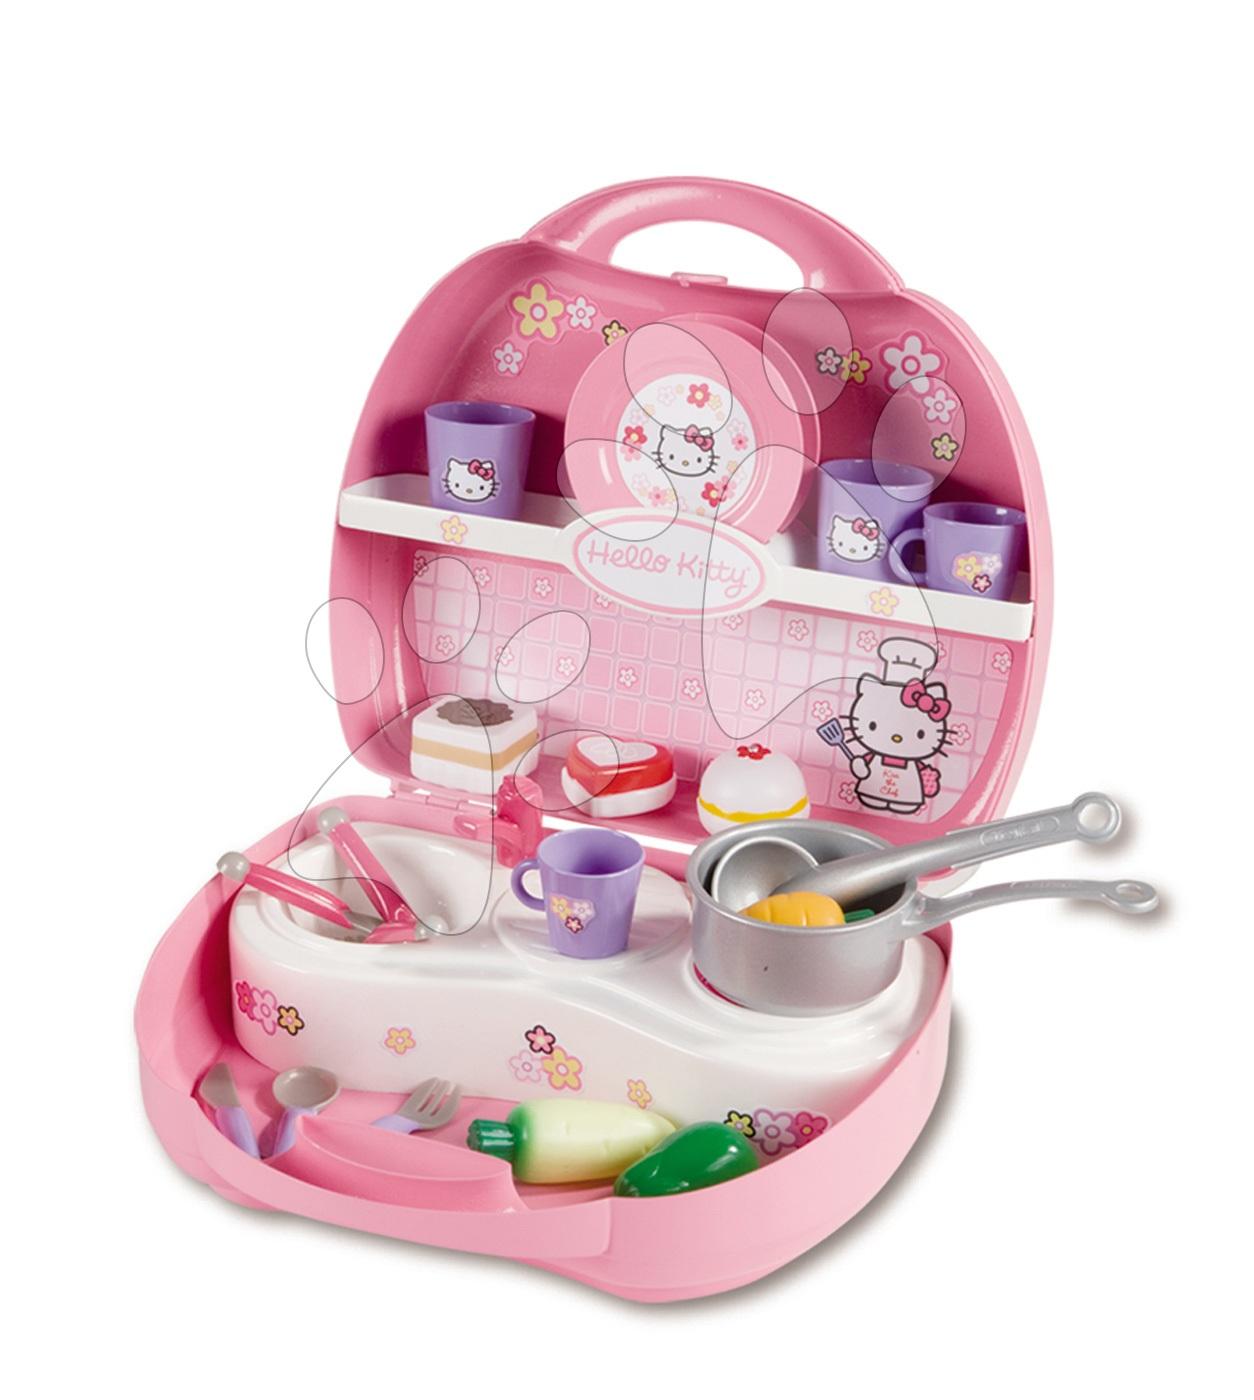 Kuhinja Hello Kitty Mini Cuisine Smoby v kovčku in 20 dodatki svetlorožnata